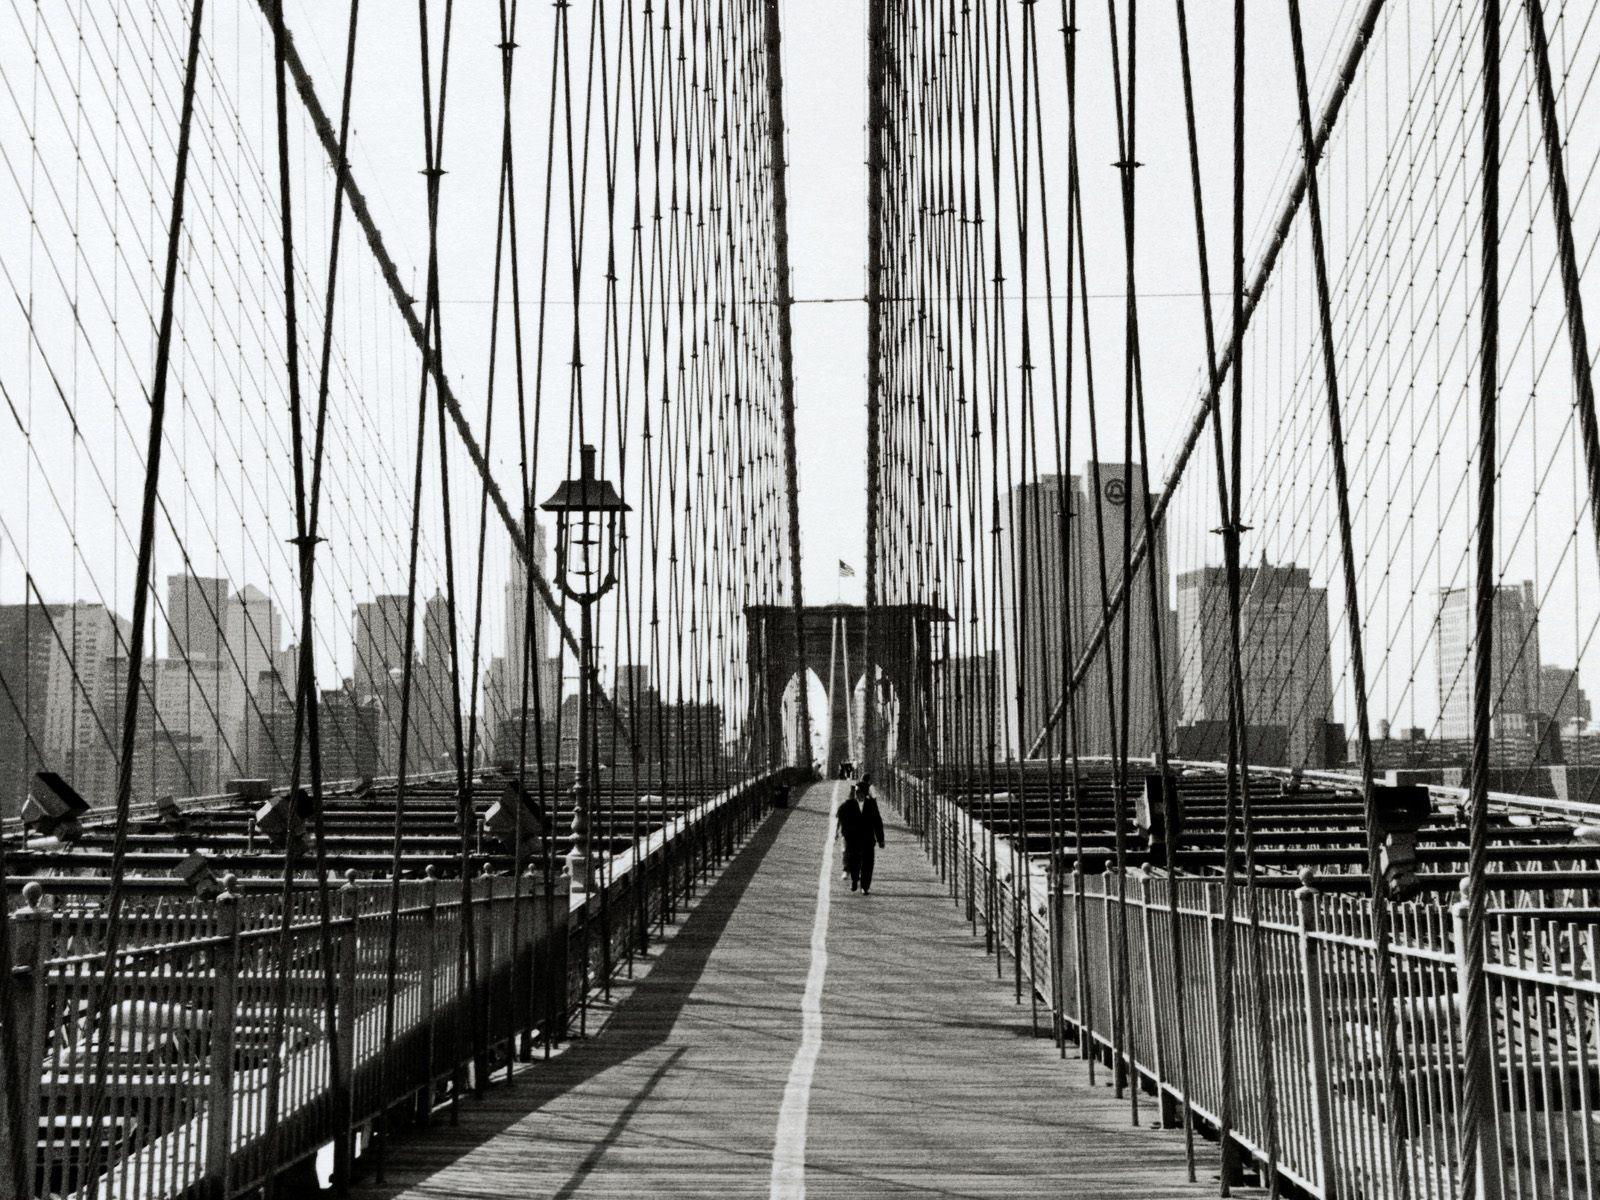 Ecran hd gratuit new york new york in the evening wallpaper fond